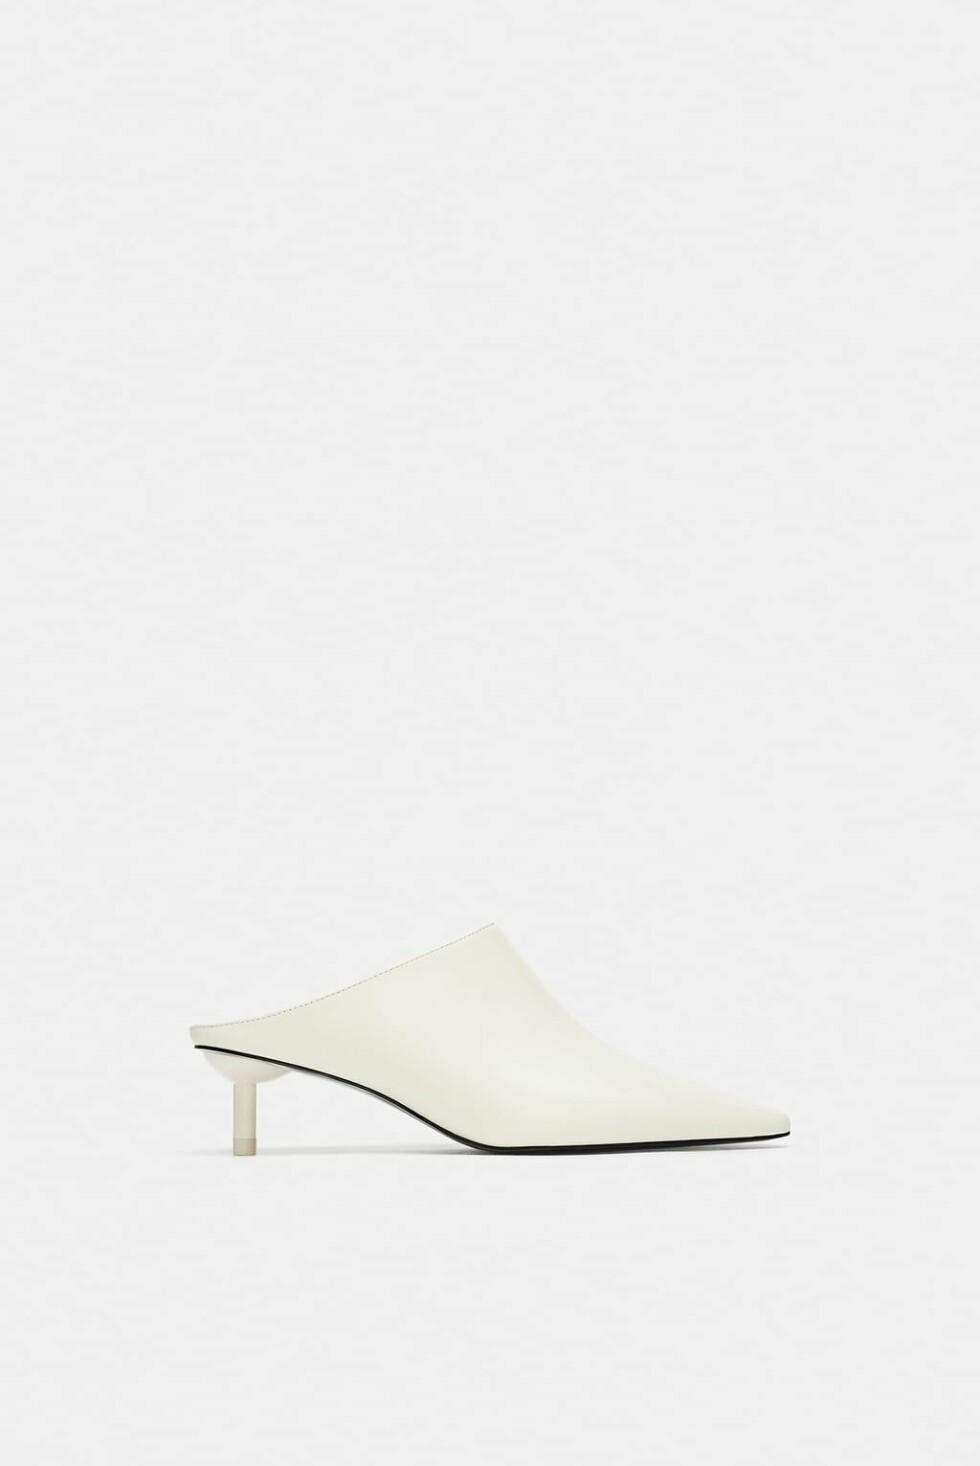 Hvite sko fra Zara |400,-| https://www.zara.com/no/no/h%C3%B8yh%C3%A6lt-sko-med-%C3%A5pen-h%C3%A6l-og-vriststykke-p17204301.html?v1=6449247&v2=1177663